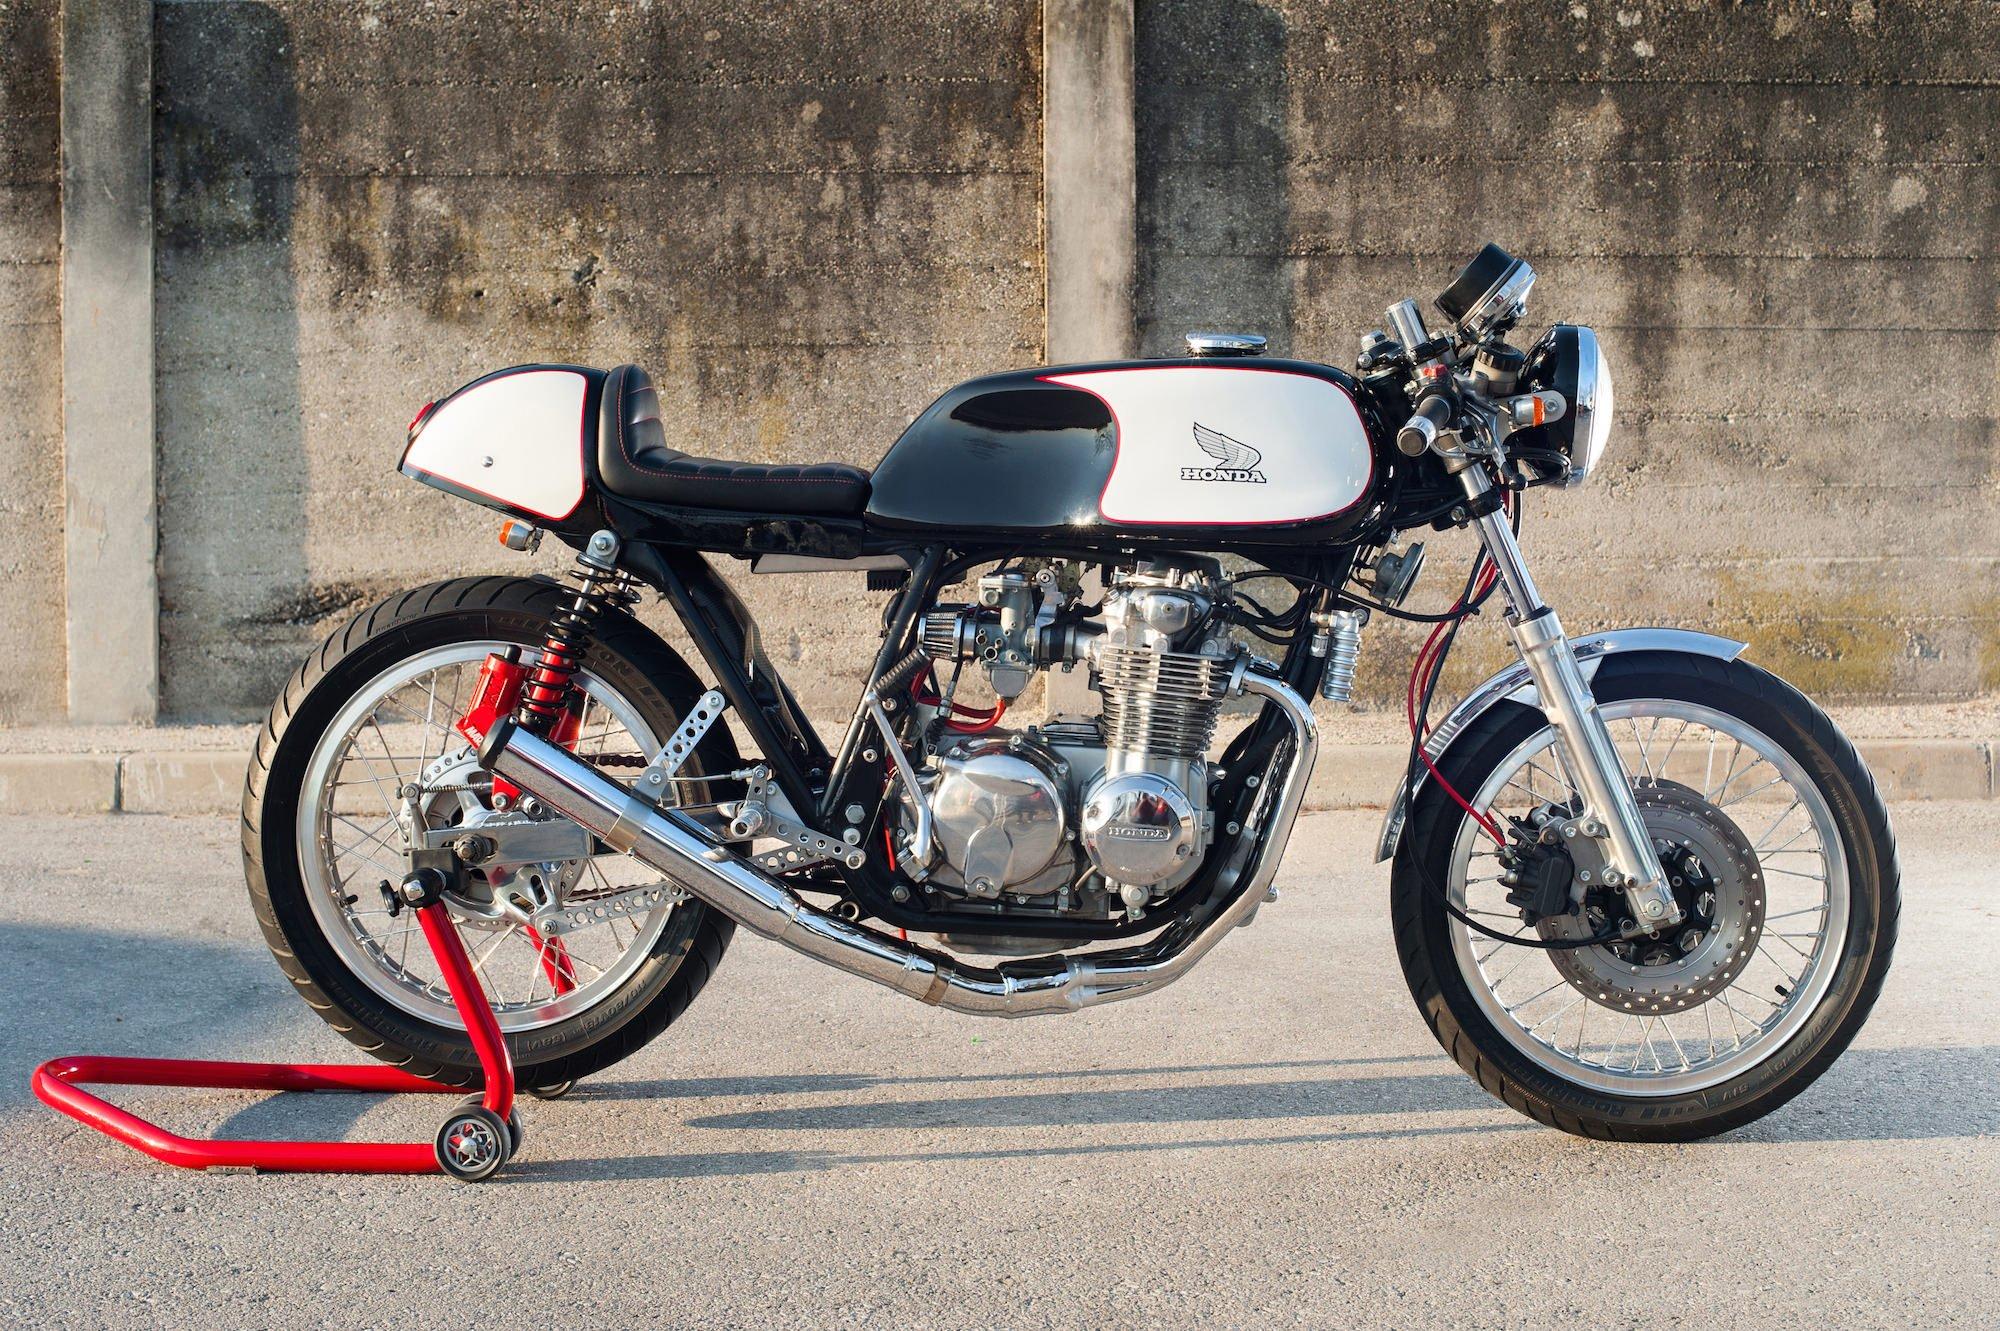 Has Harley Davidson Bought Ducati